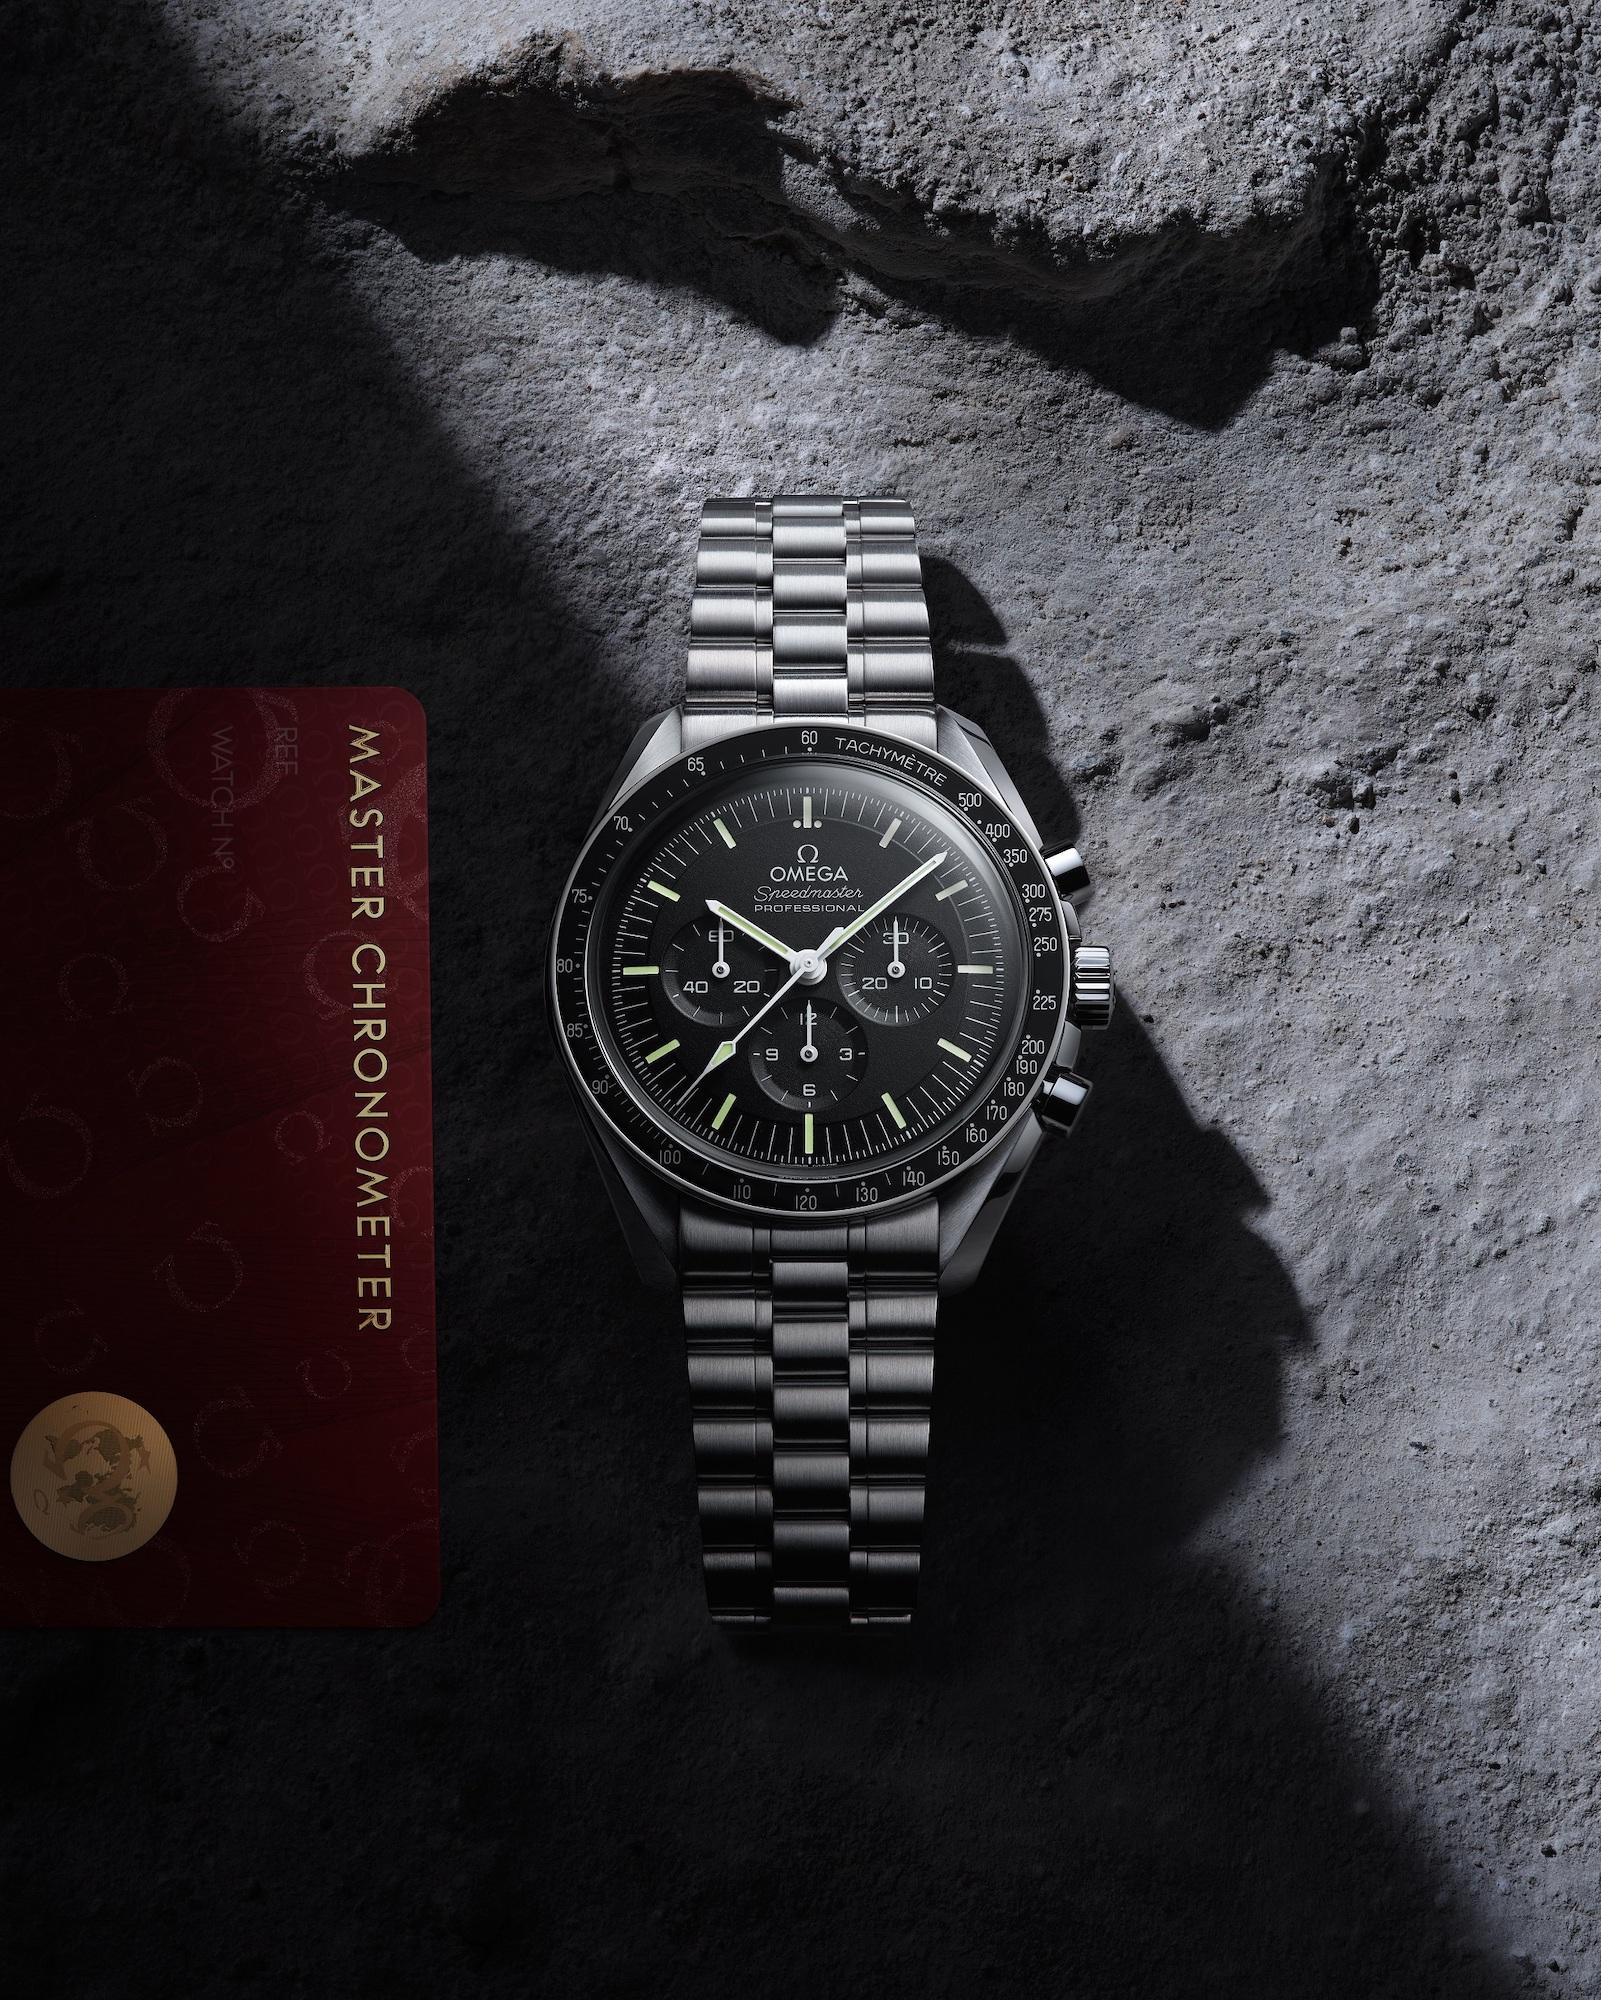 Omega Speedmaster Moonwatch 310.32.42.50.01.001 Master Chronometer